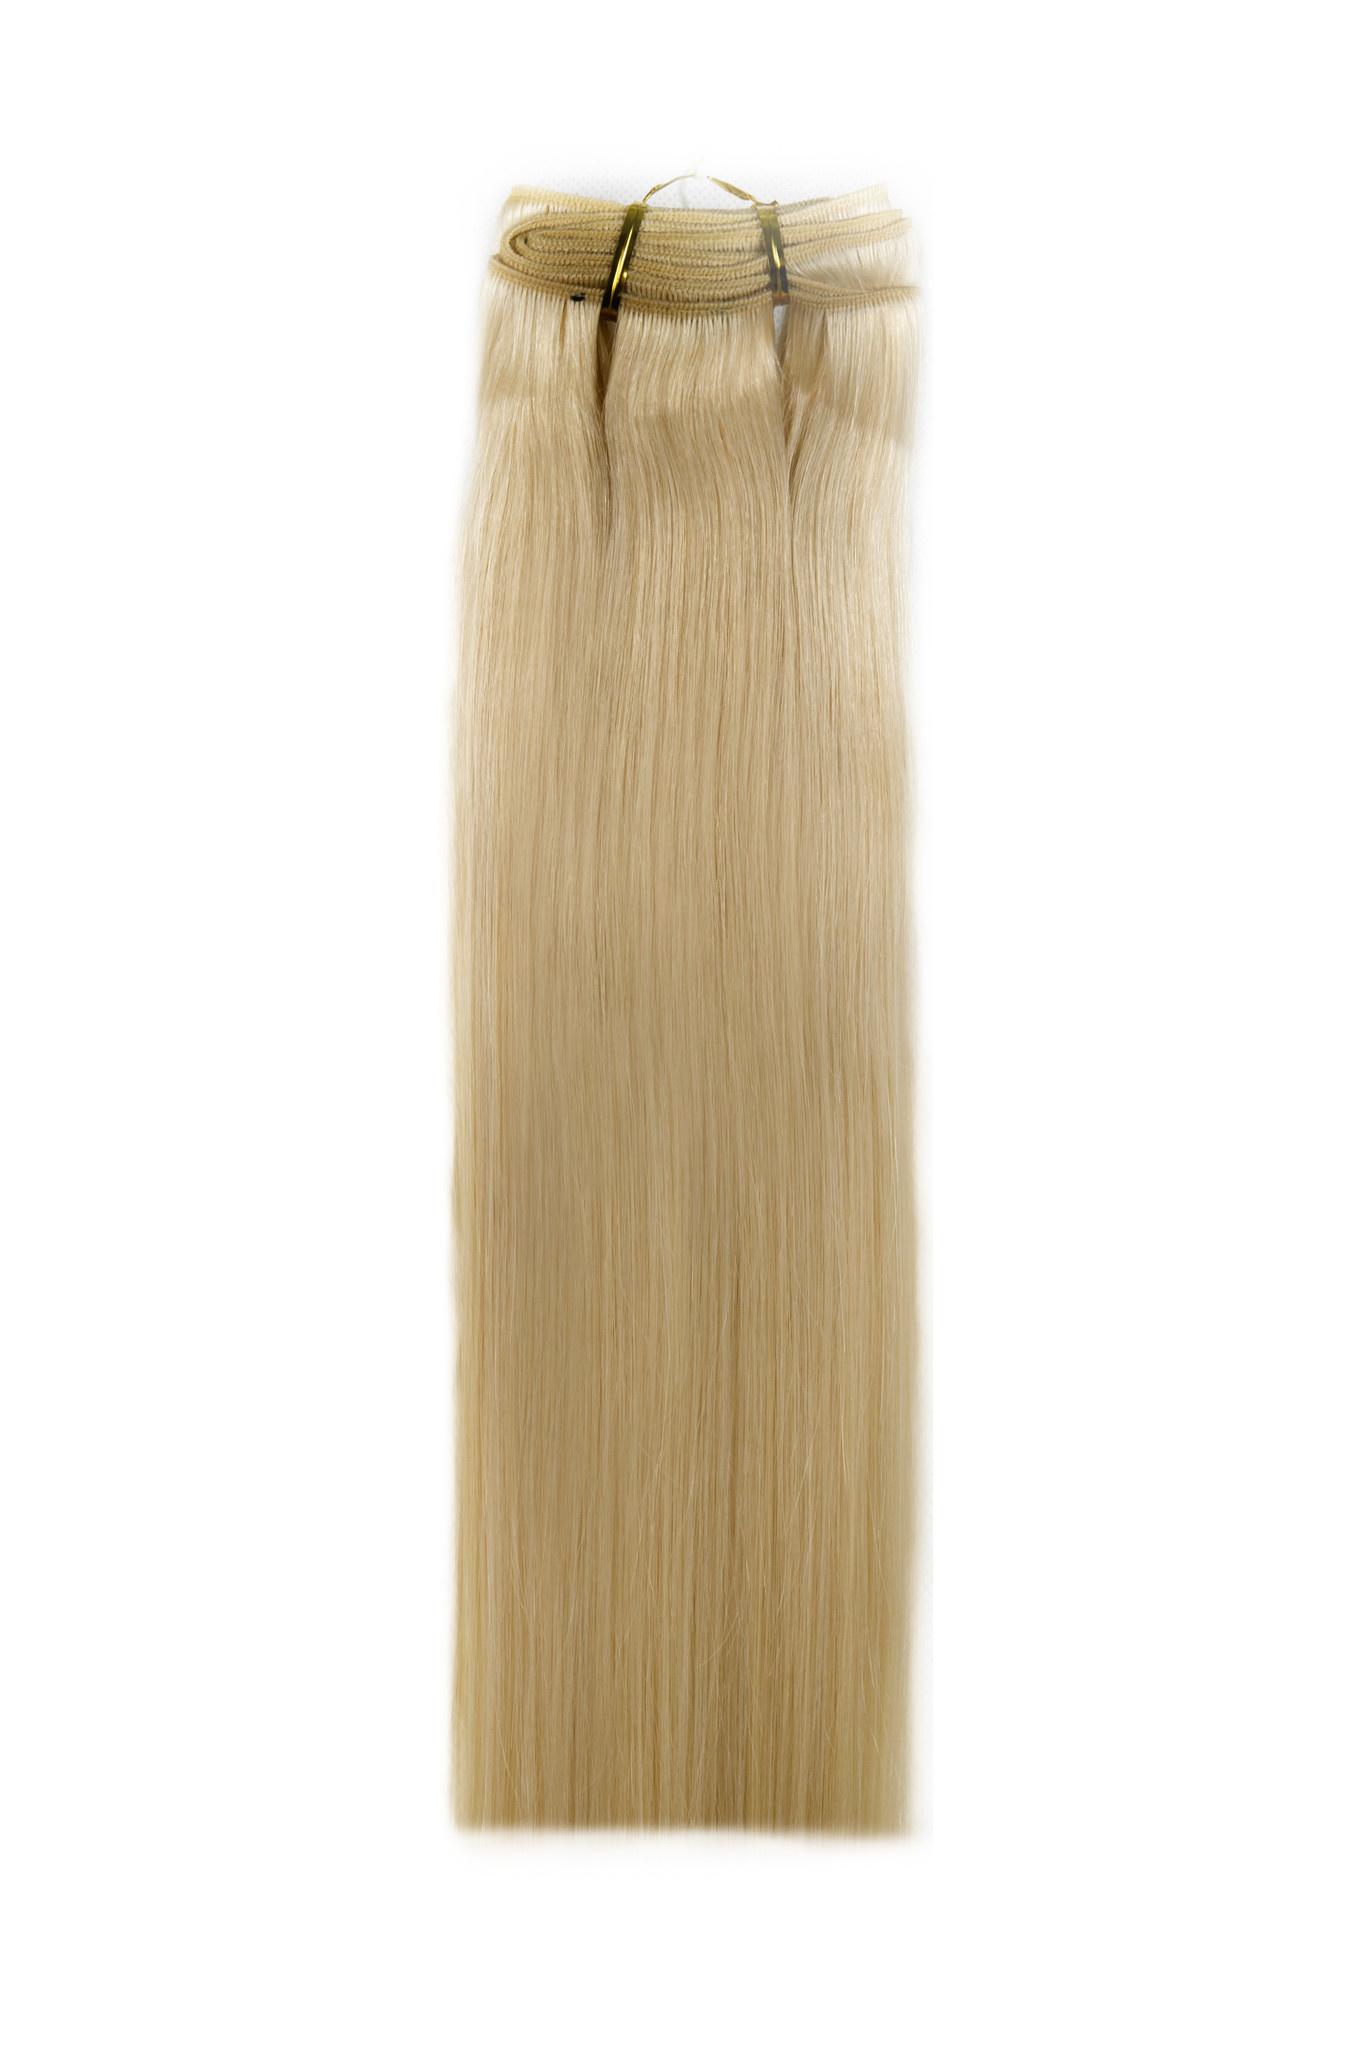 SHRI Indian (Shri) Hair weave (Steil) - #60 White Blonde